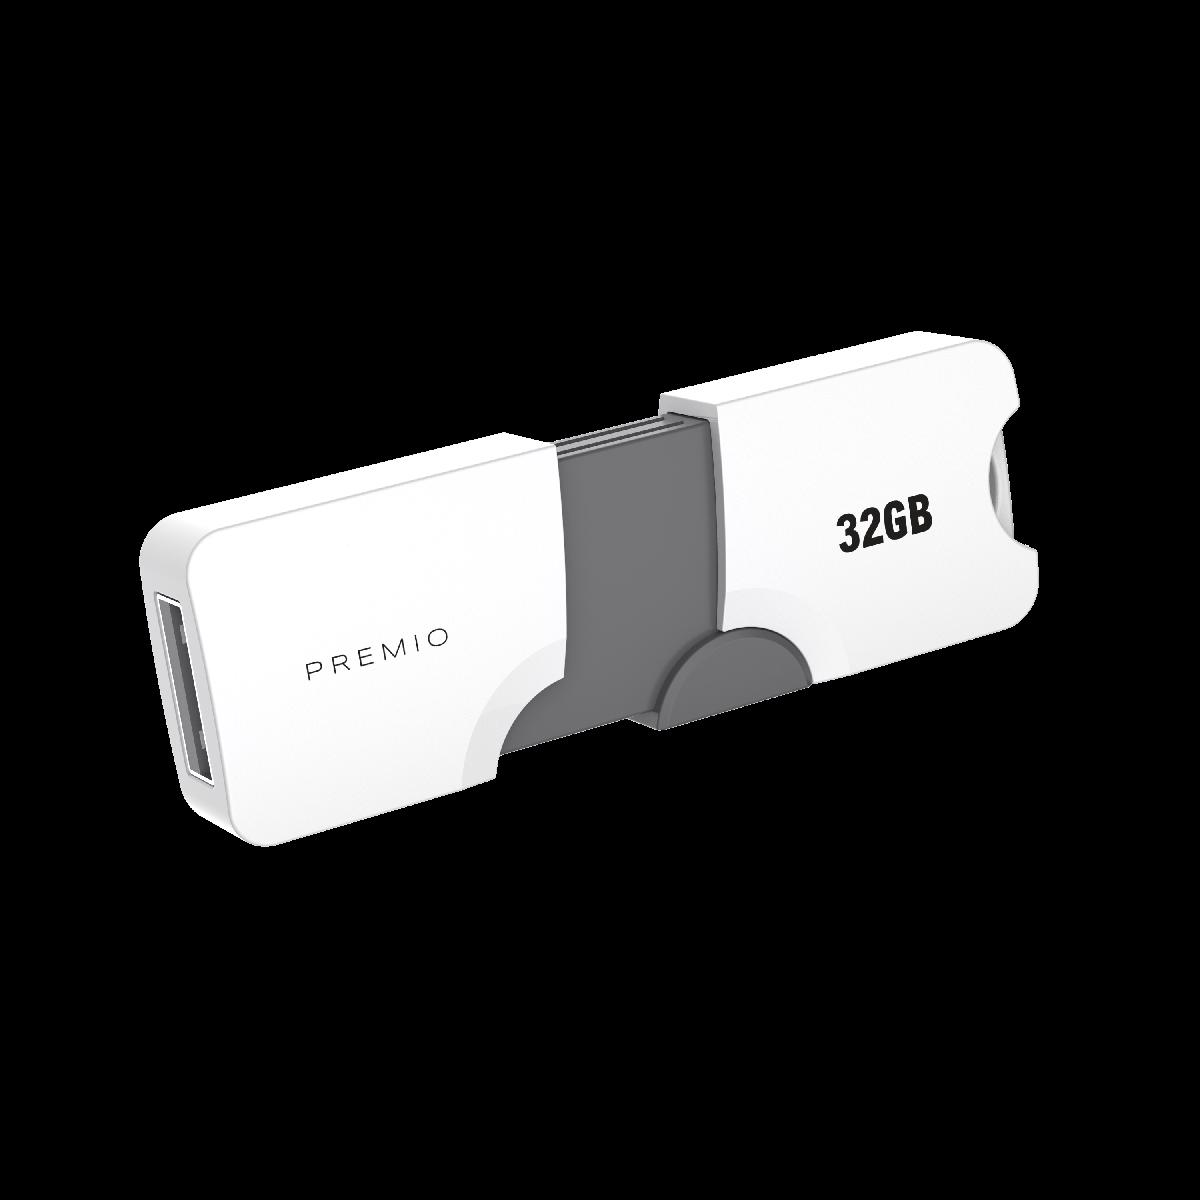 Premio USB Flash 32GB